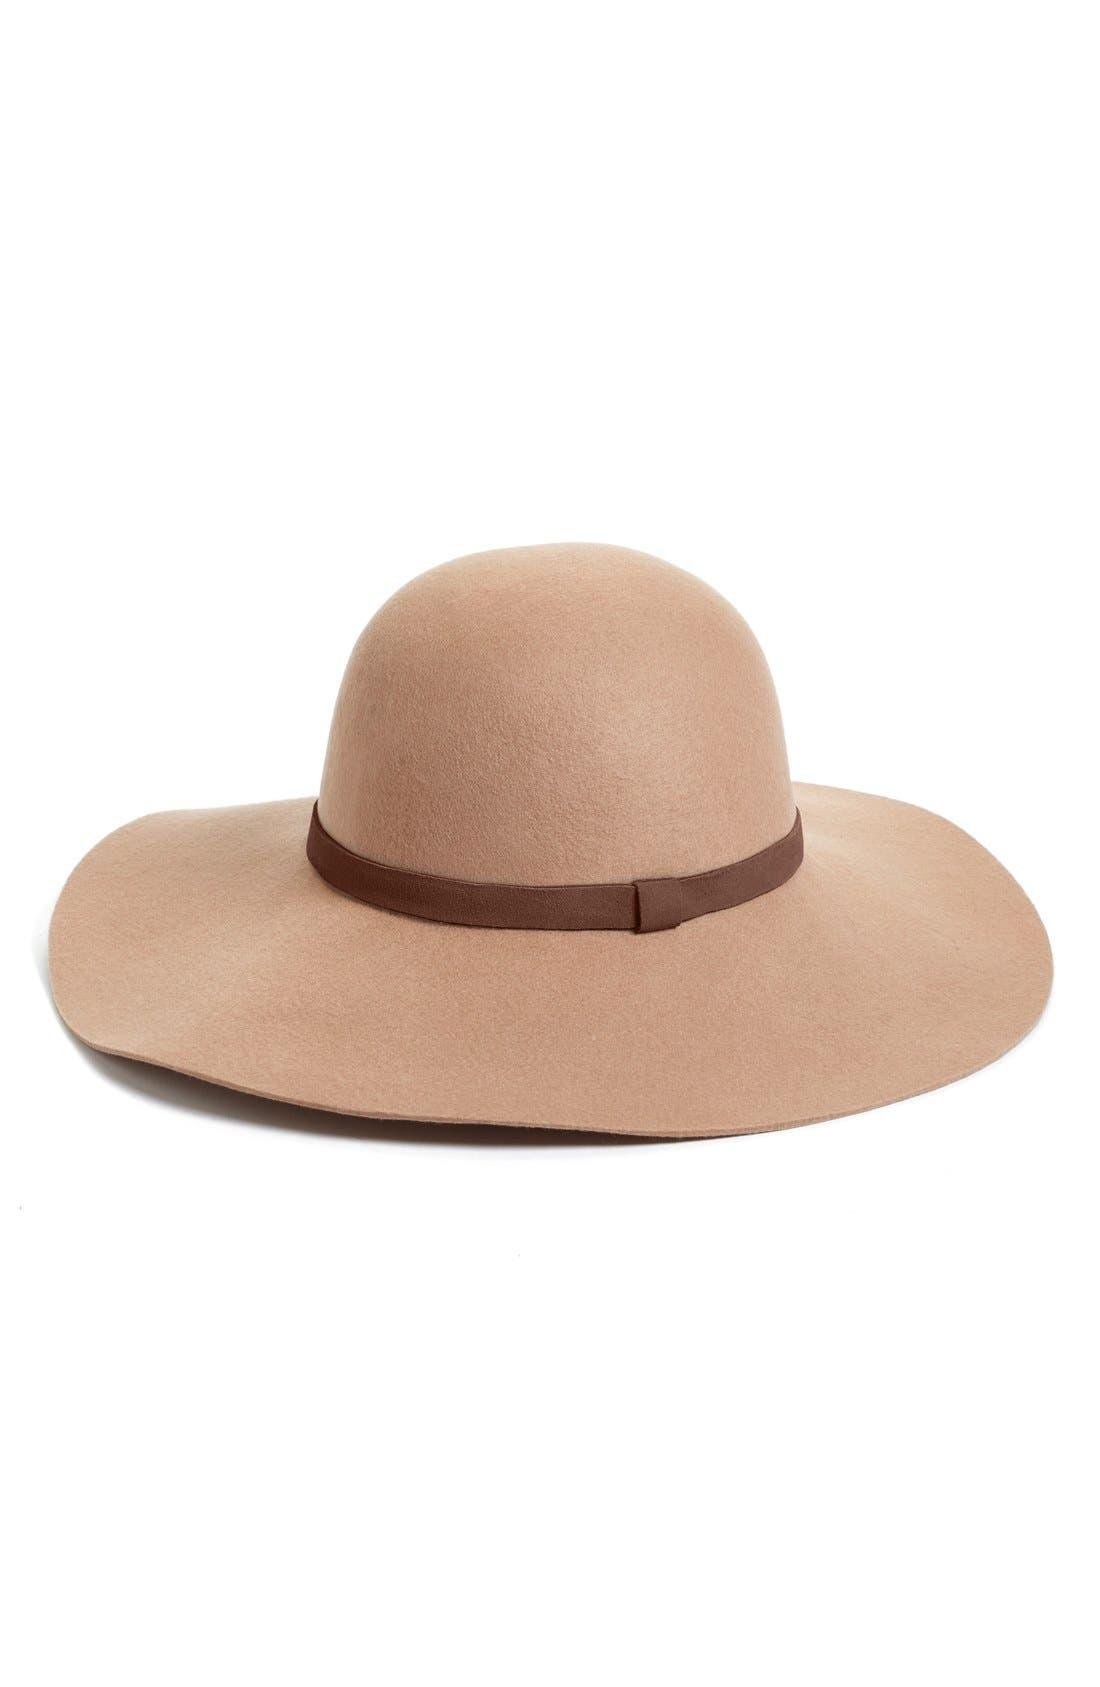 Alternate Image 1 Selected - Caslon® Suede Trim Floppy Wool Hat